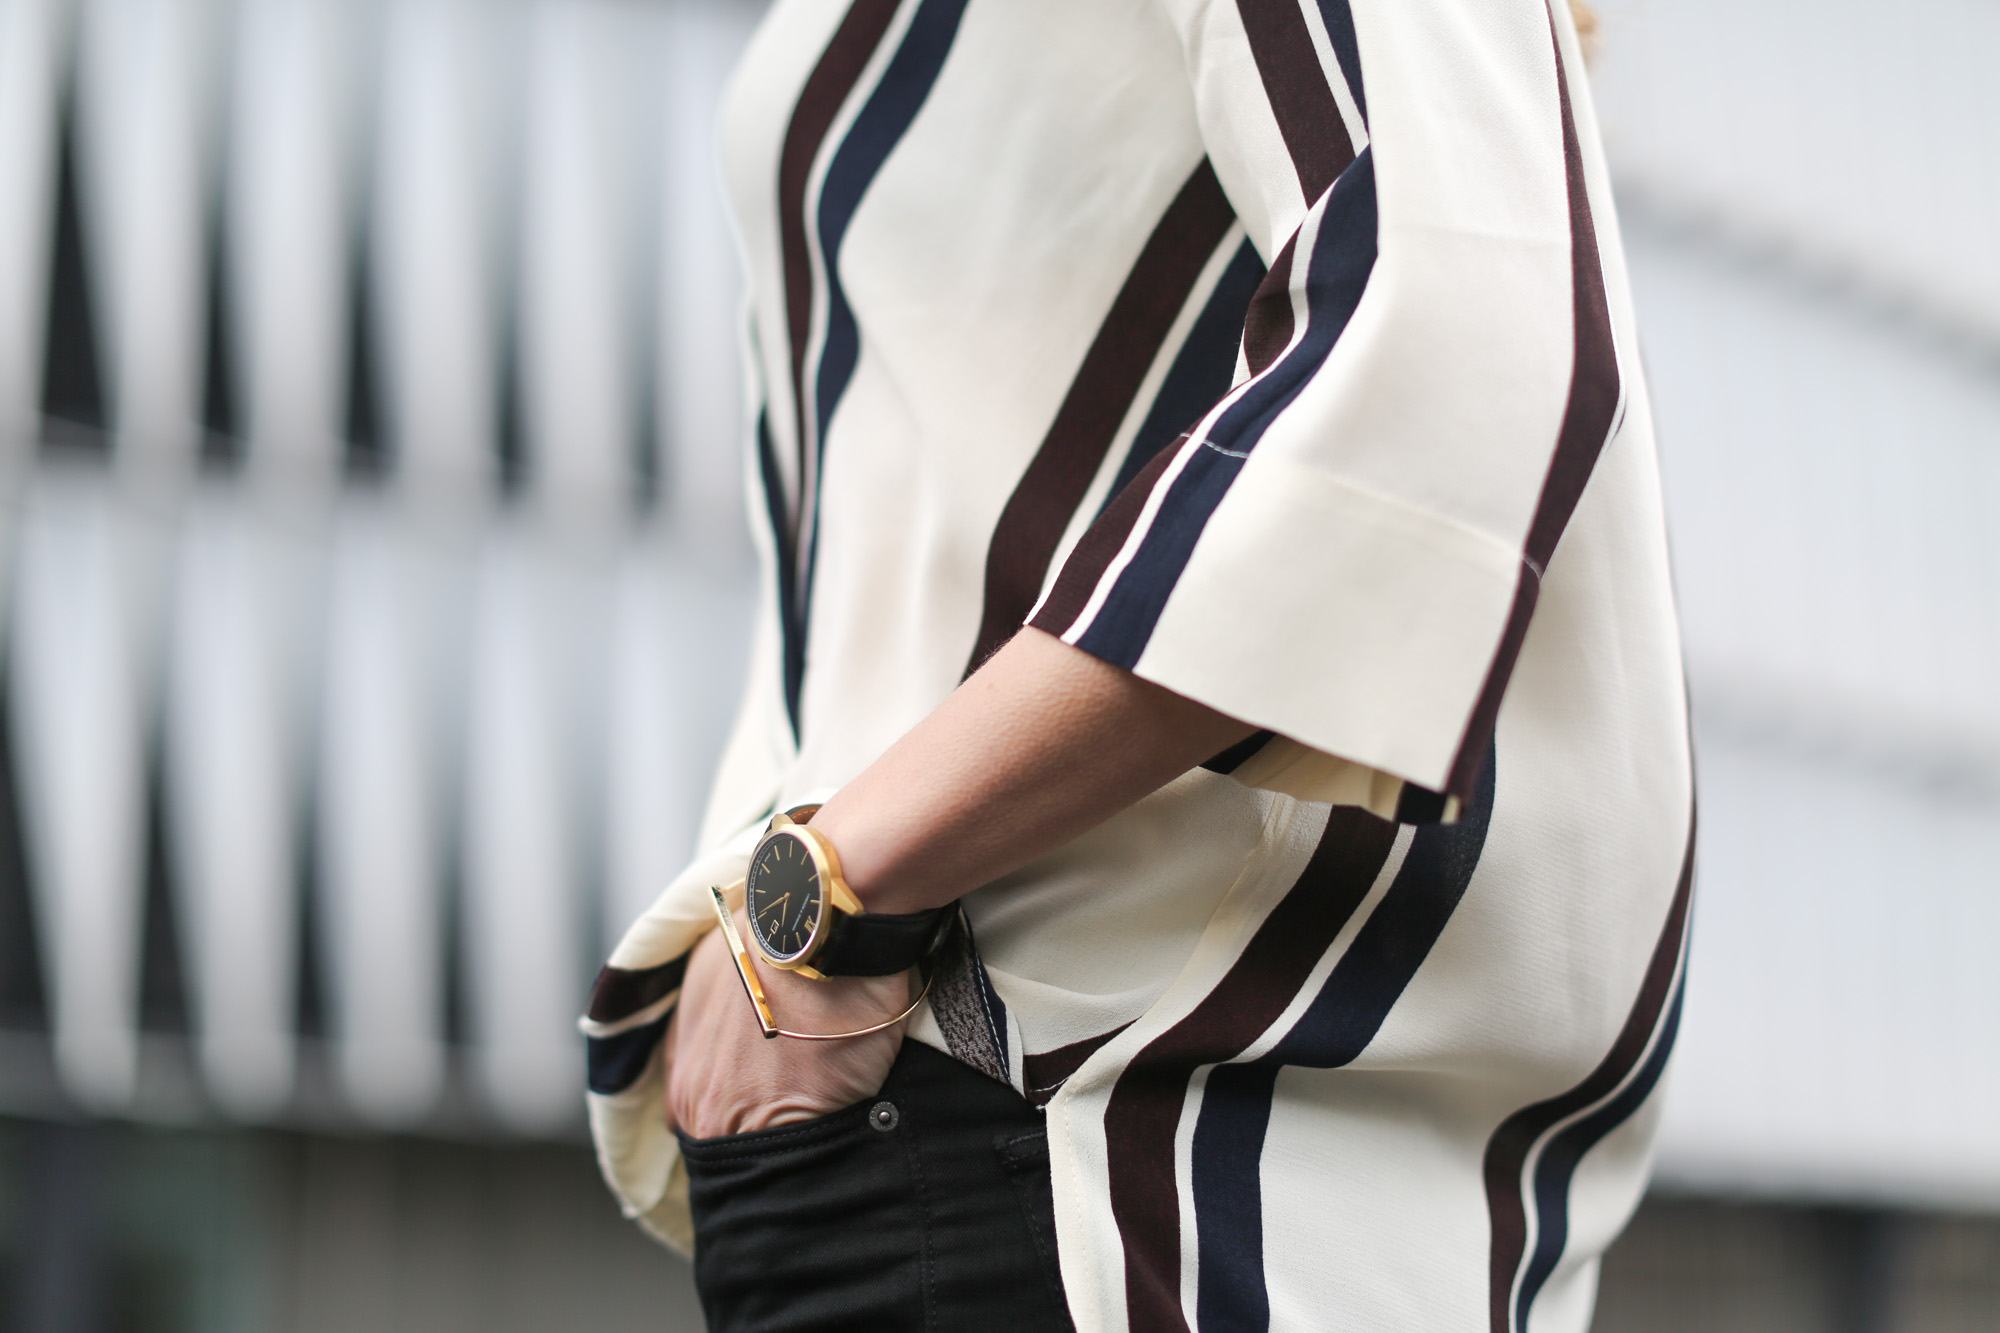 Clochet-streetstyle-topshop-shirt-fedora-hat-mango-leather-biker-jacket-11